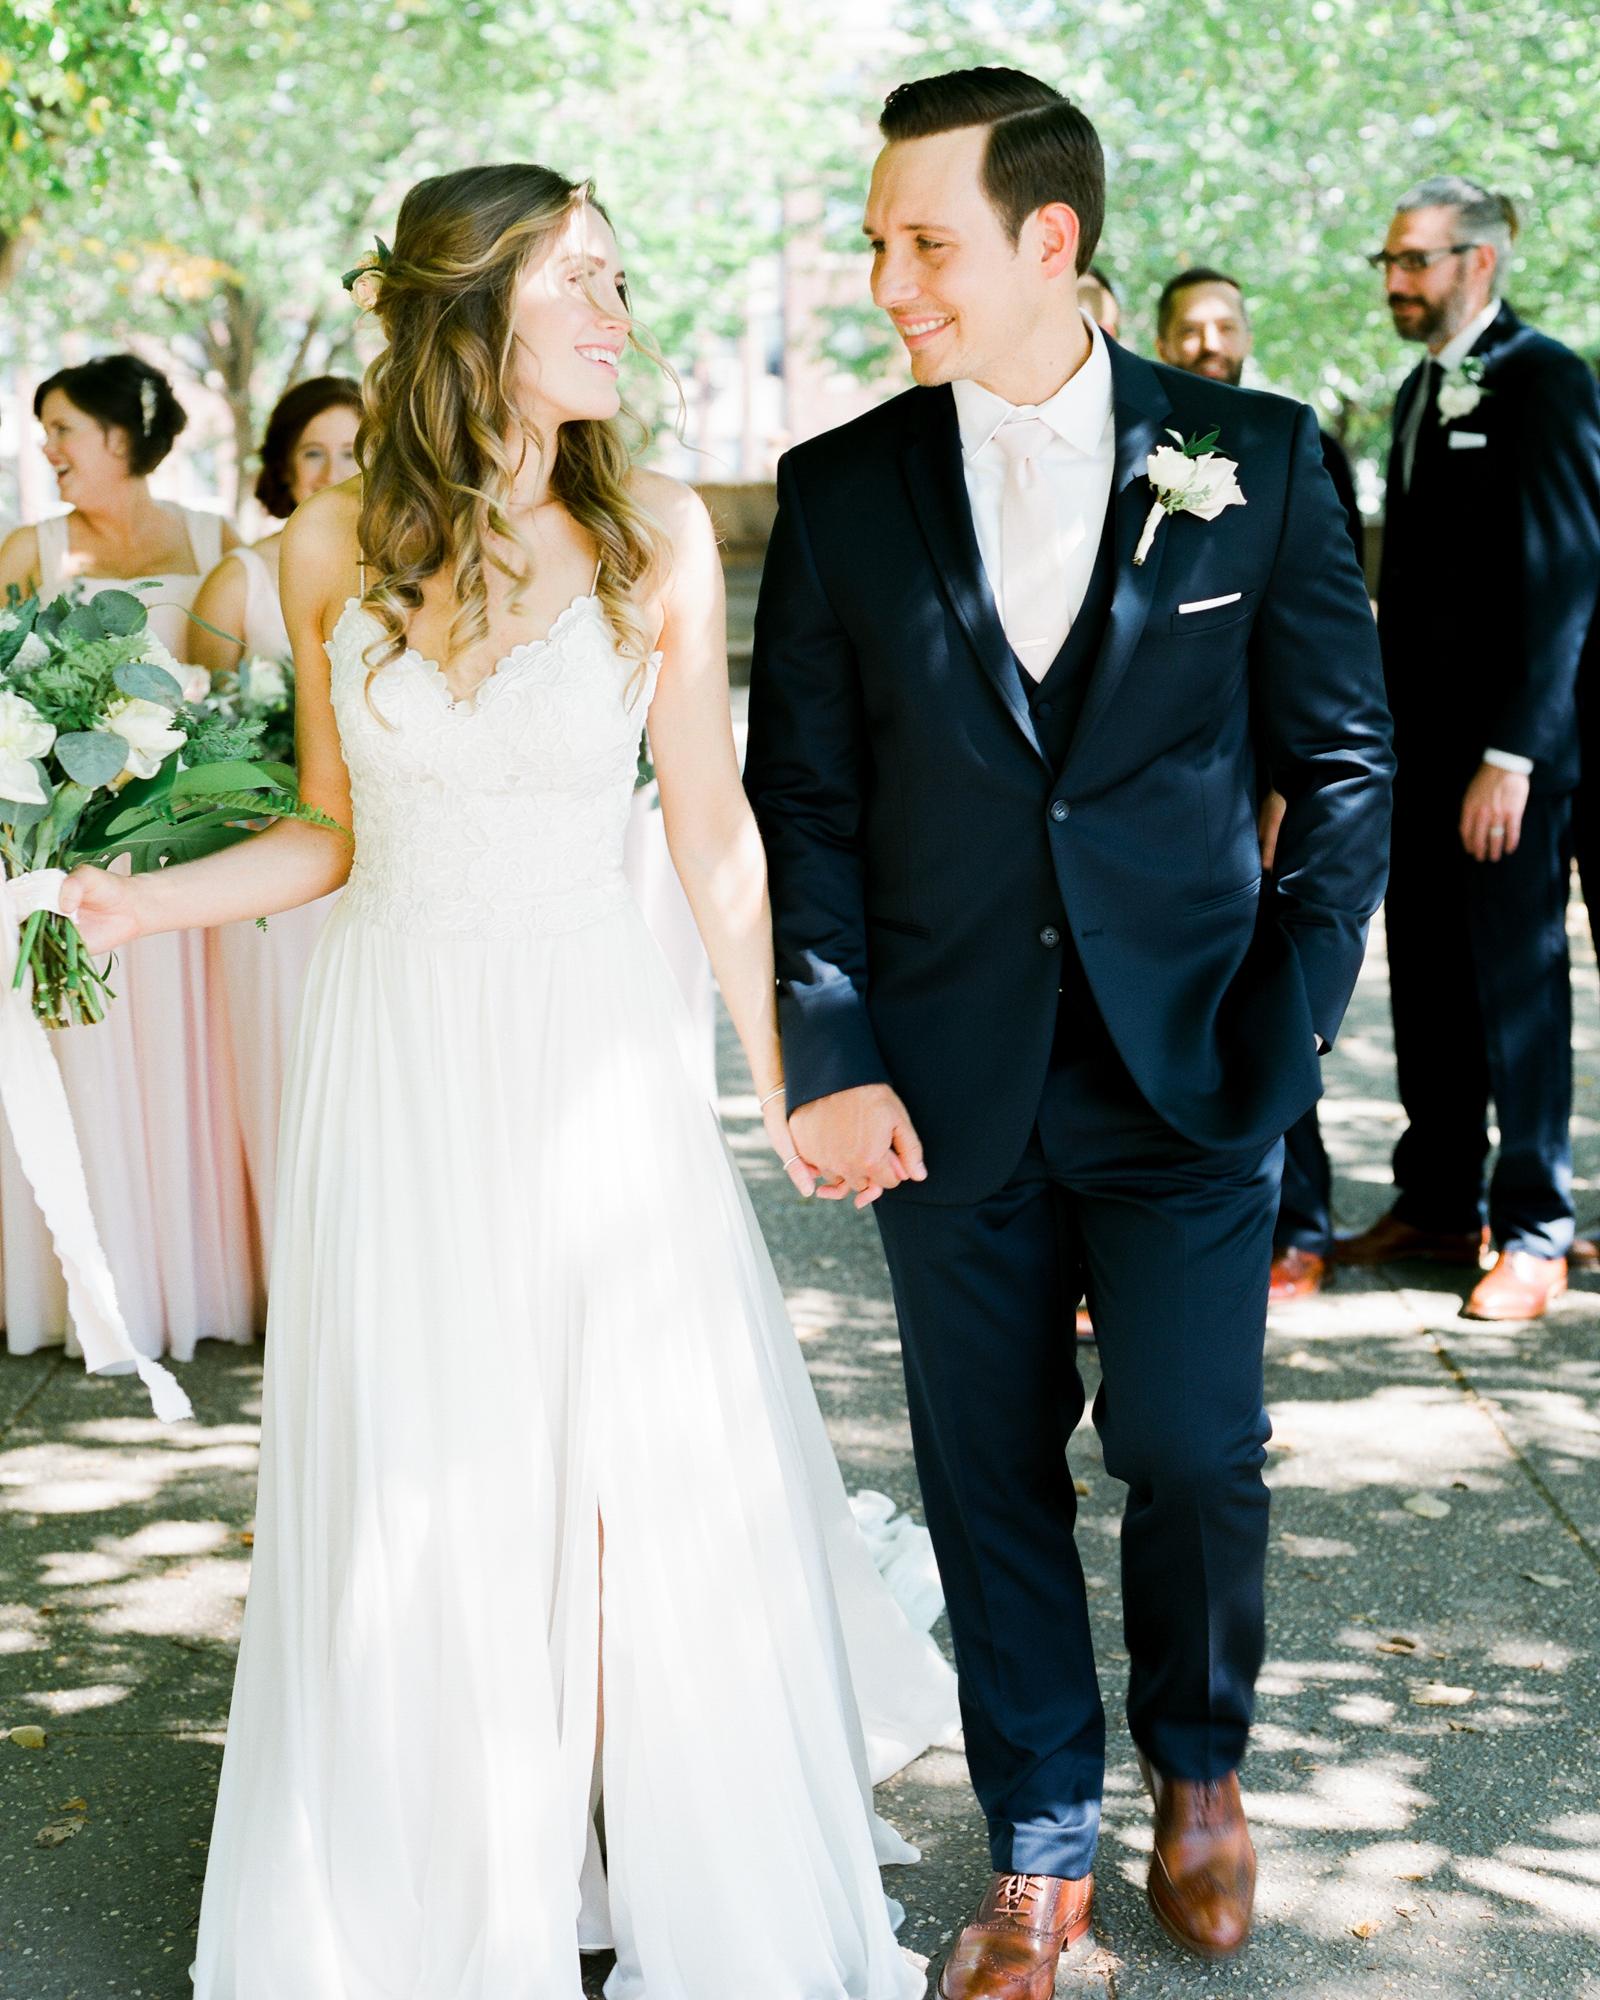 LongView-Gallery-Wedding-Art-Washington-DC-Film-Photographer-12.jpg